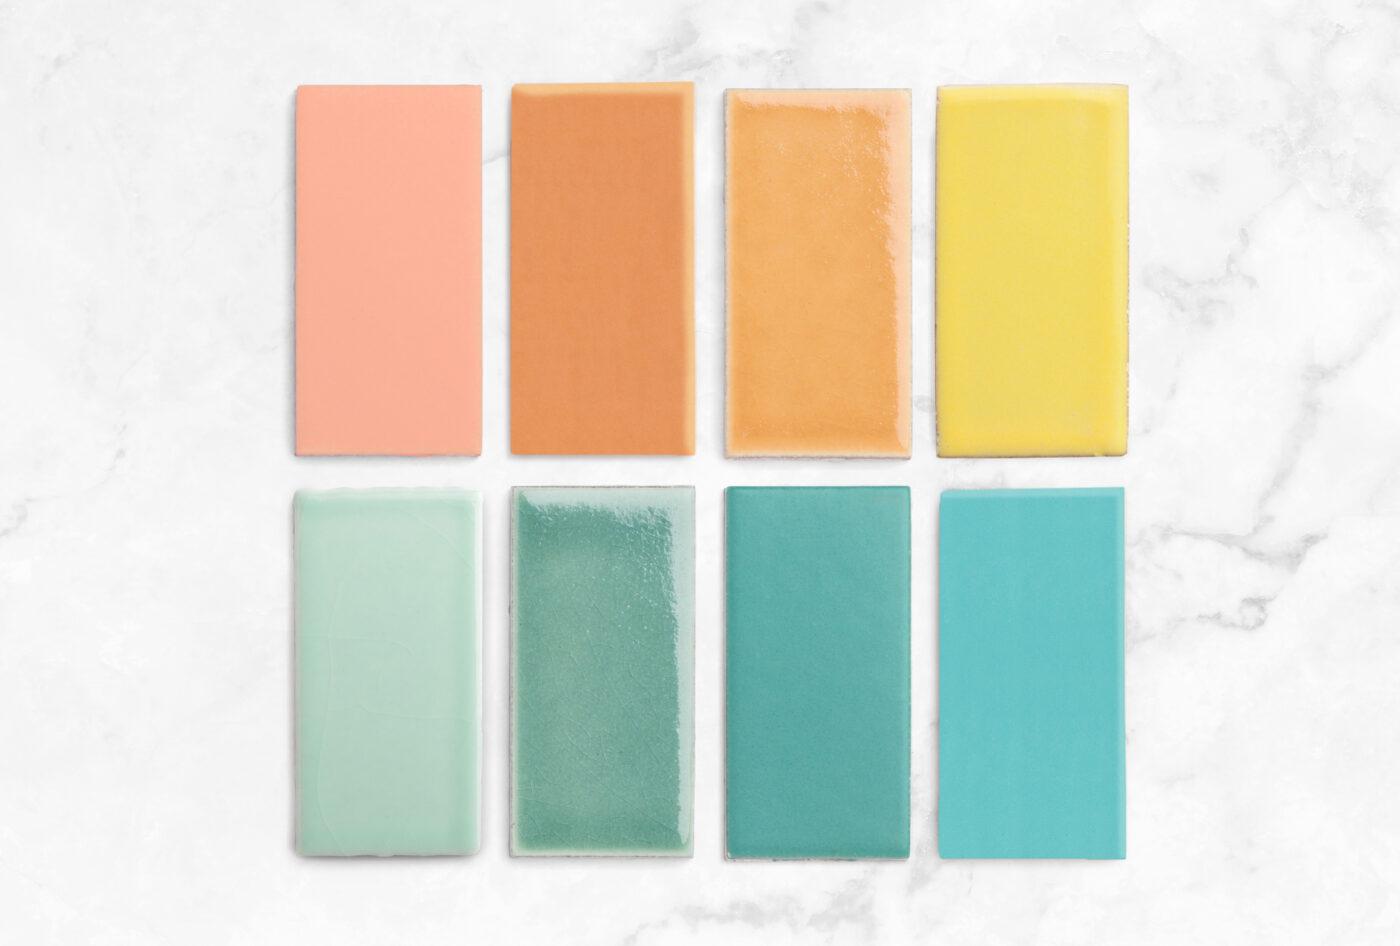 2020 Q4 Rainbow Bath Spotlight Sample Pack Desert Bloom Sorbet Koi Lemon Cream Glacier Bay Amalfi Coast Neptune Turquoise